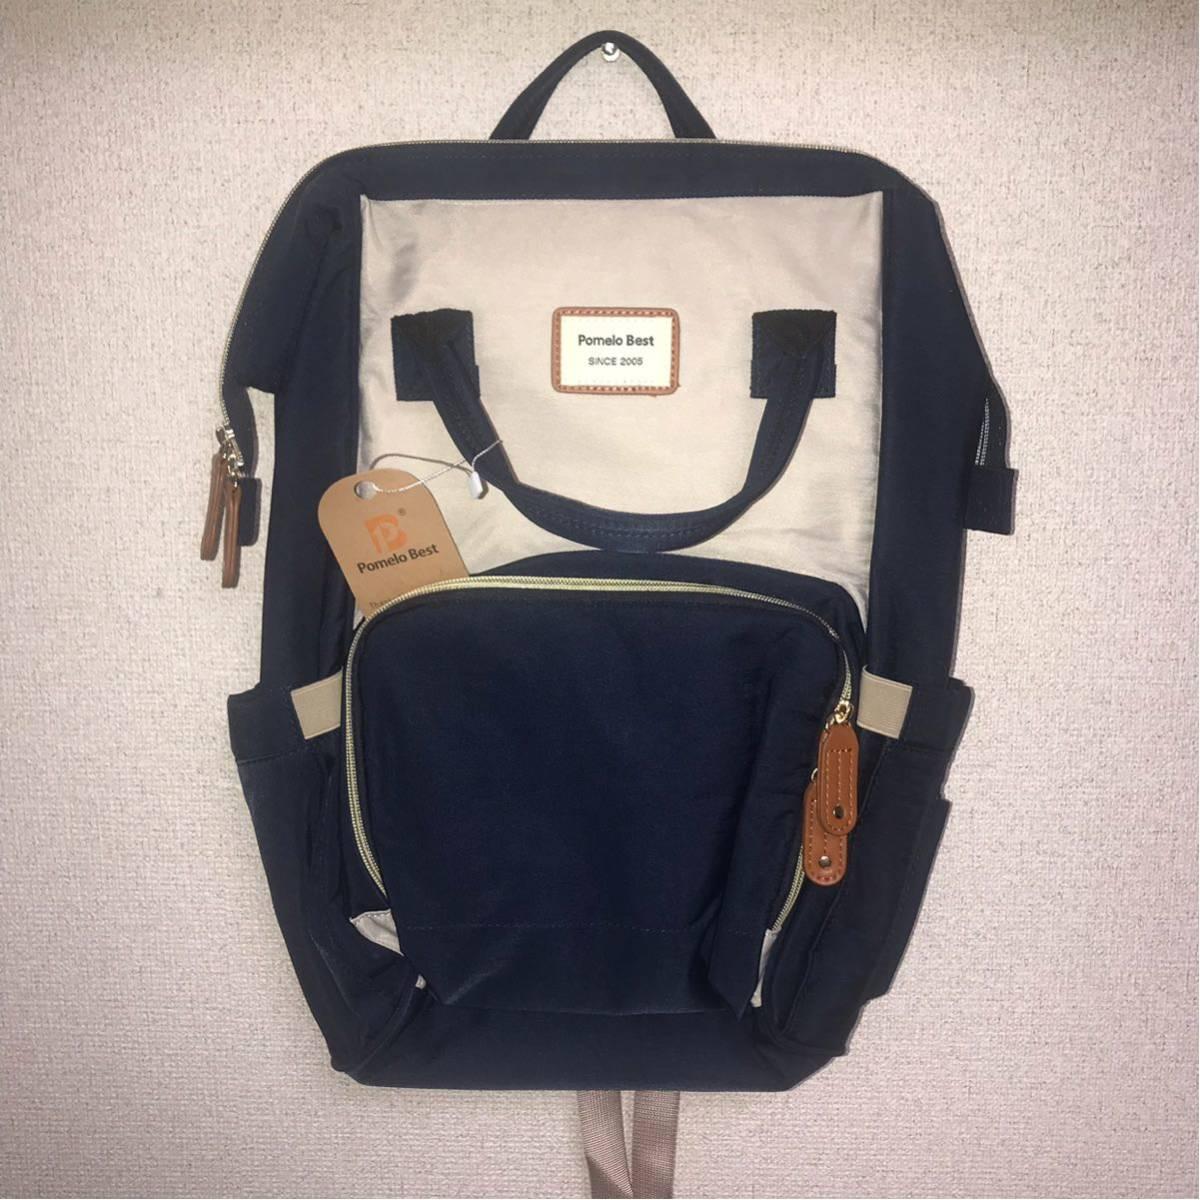 PB-21マザーズバッグ マザーズリュック 多機能 軽量 大容量03